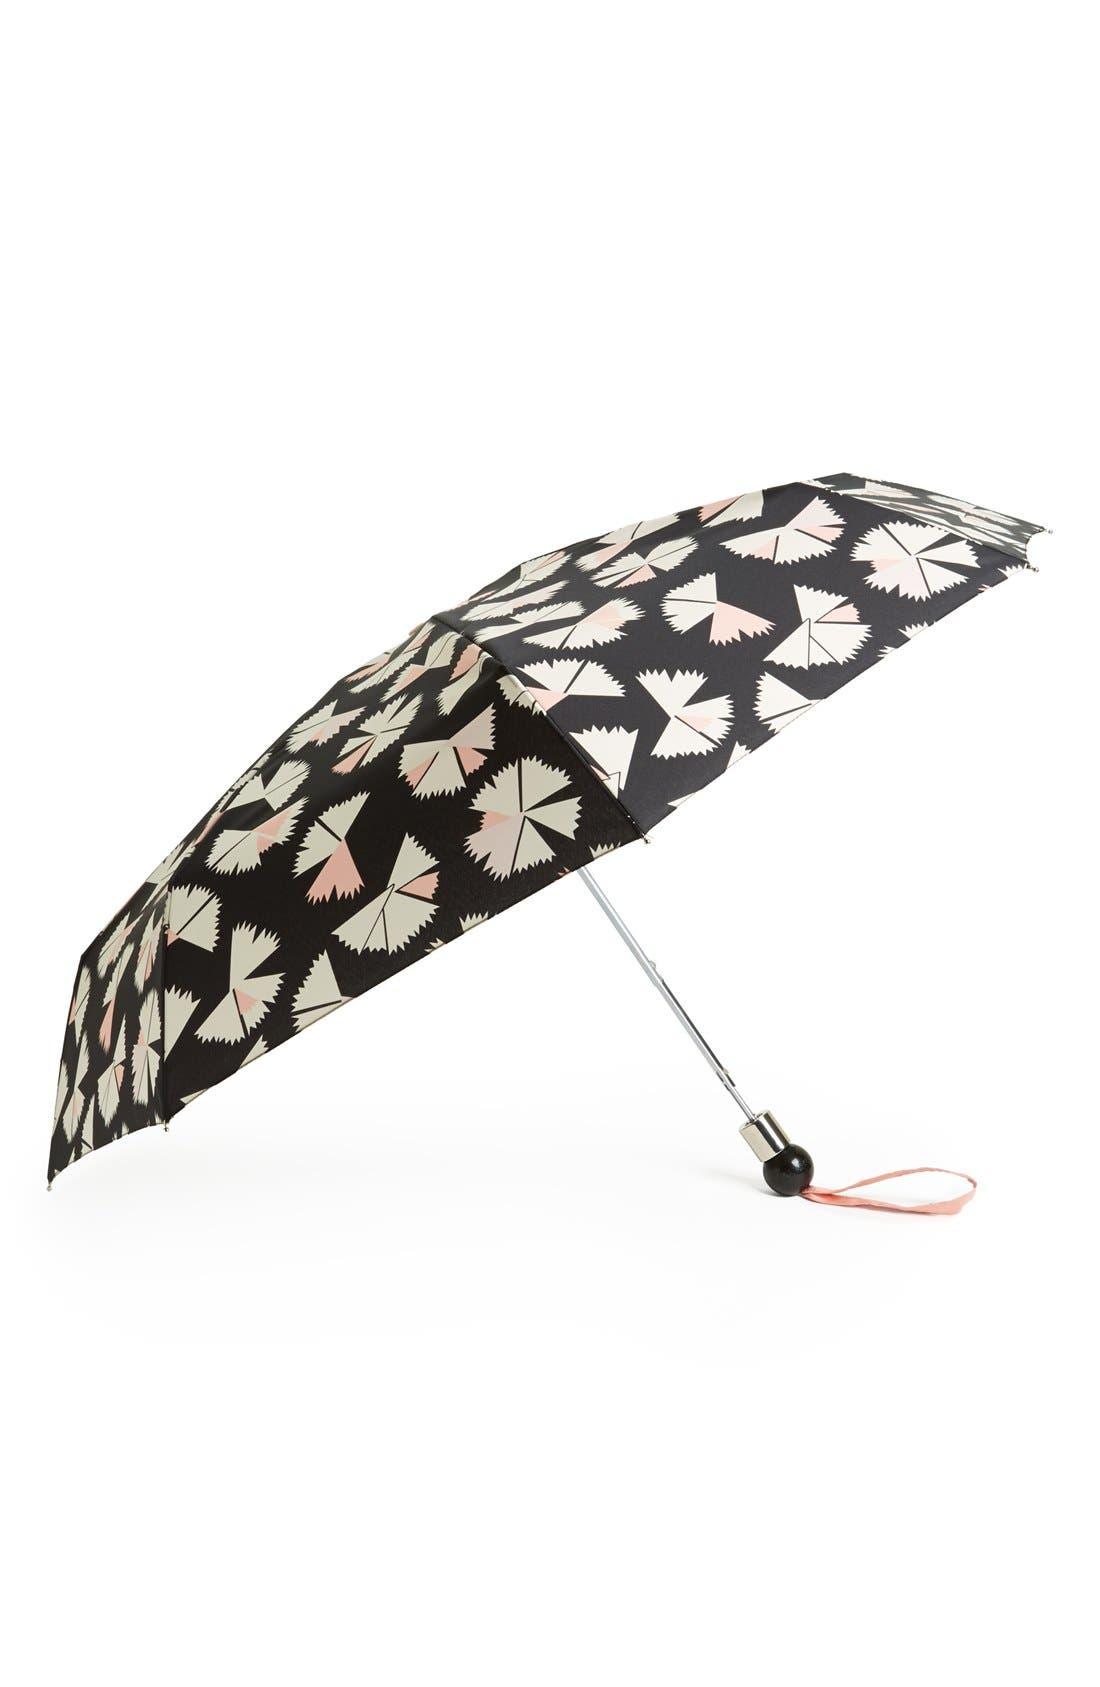 Main Image - MARC BY MARC JACOBS 'Pinwheel' Umbrella